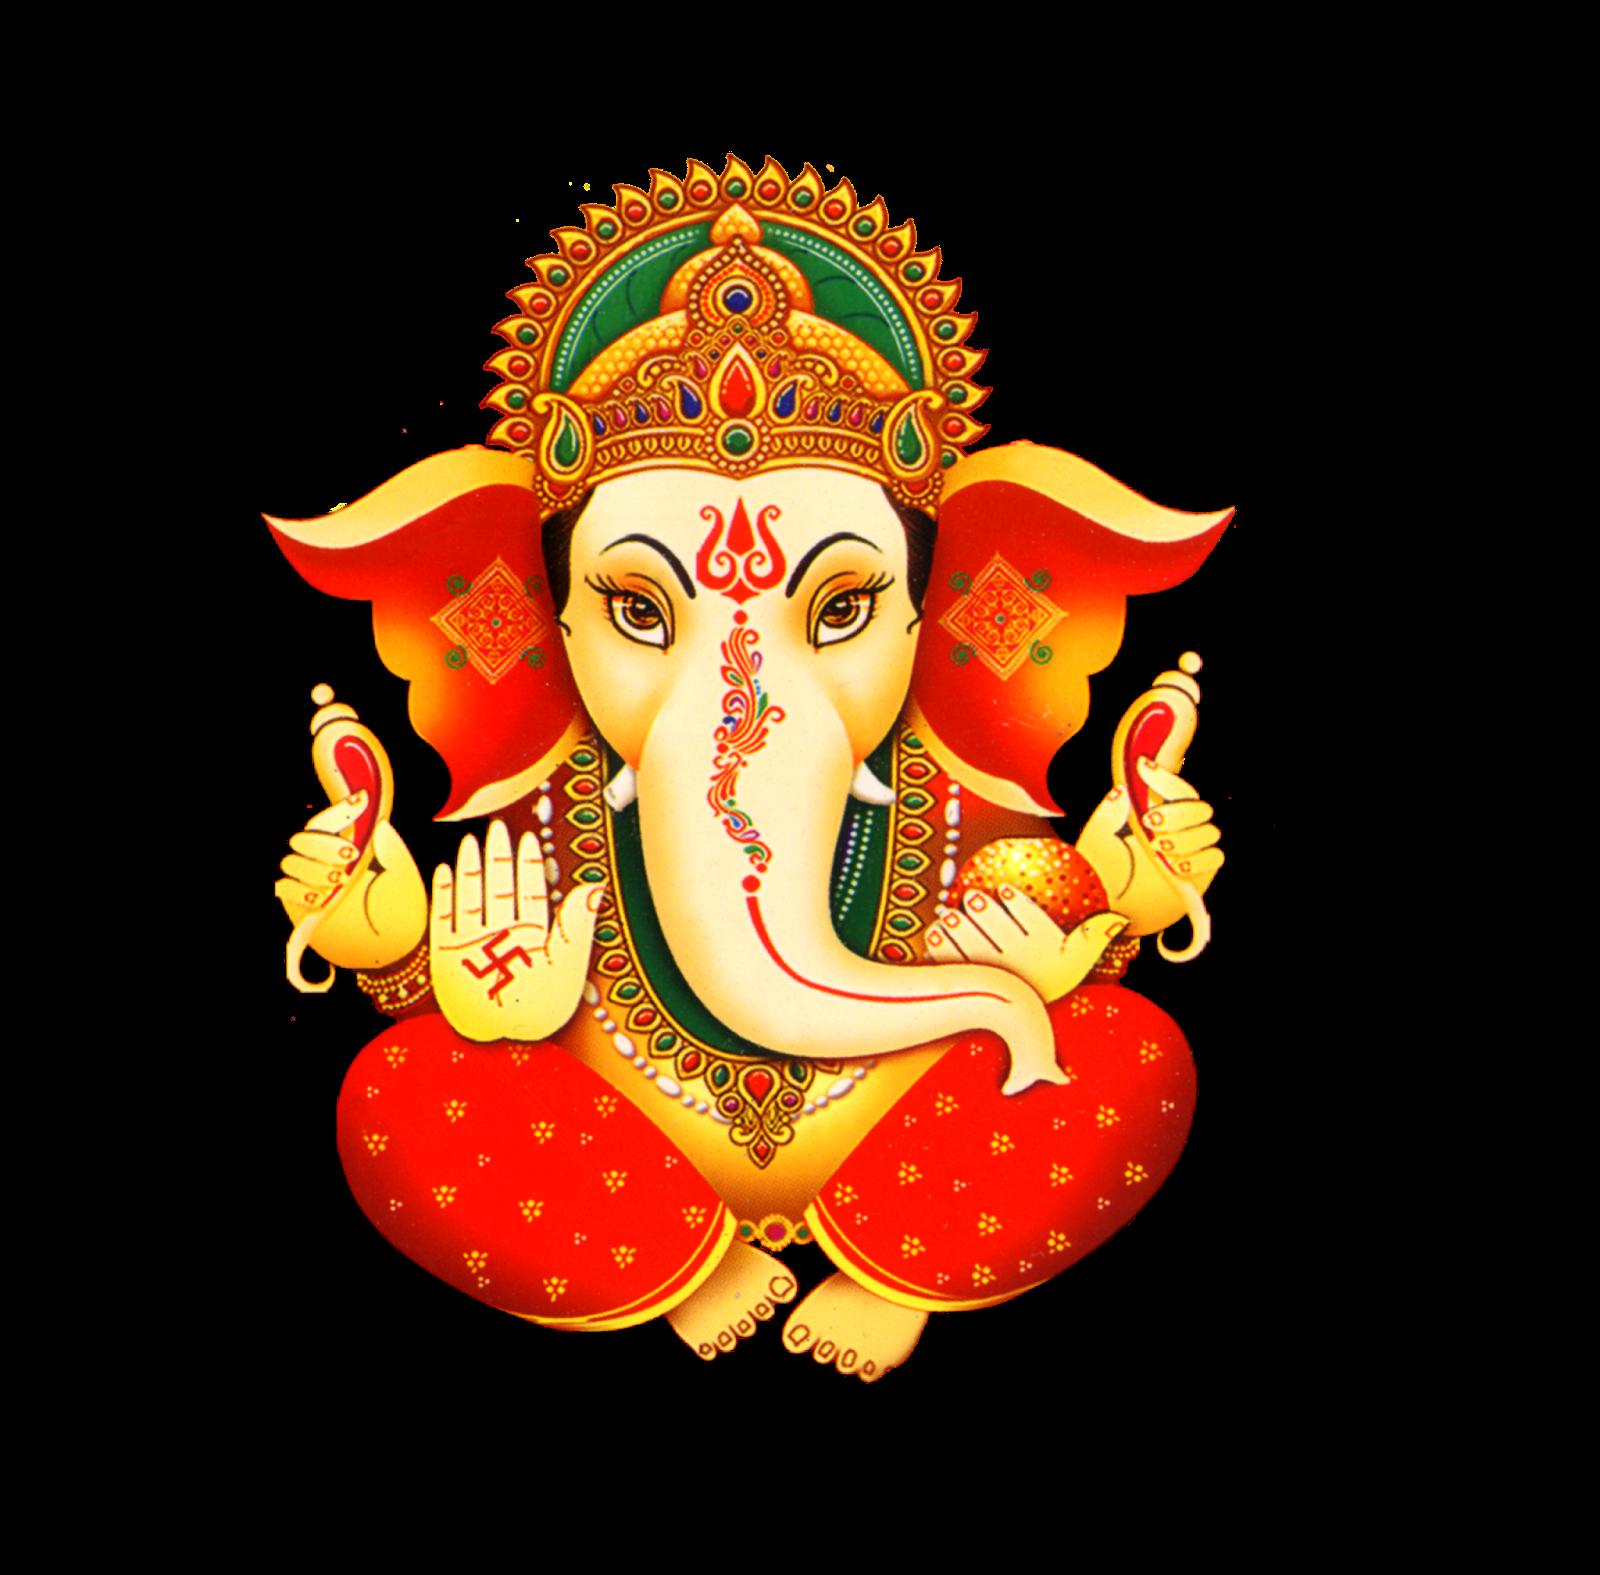 SRI VARASIDDHI VINAYAKA LORD VINAYAKA PHOTOS · Ganesh Png PlusPng.com  - Sri Ganesh PNG